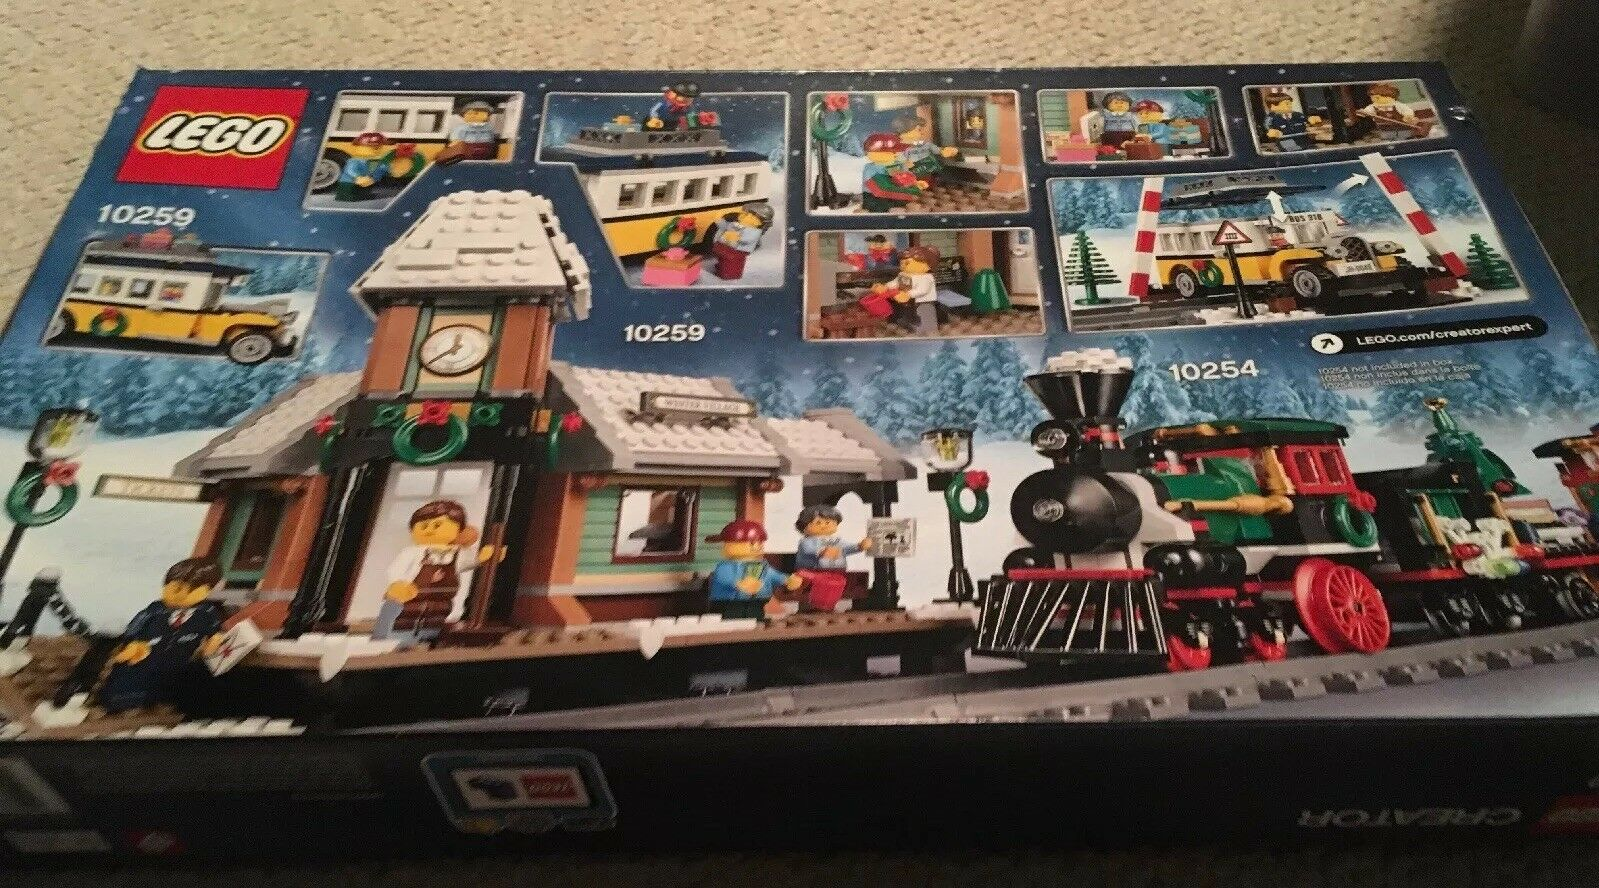 New LEGO Creator Expert Winter Village Station 10259